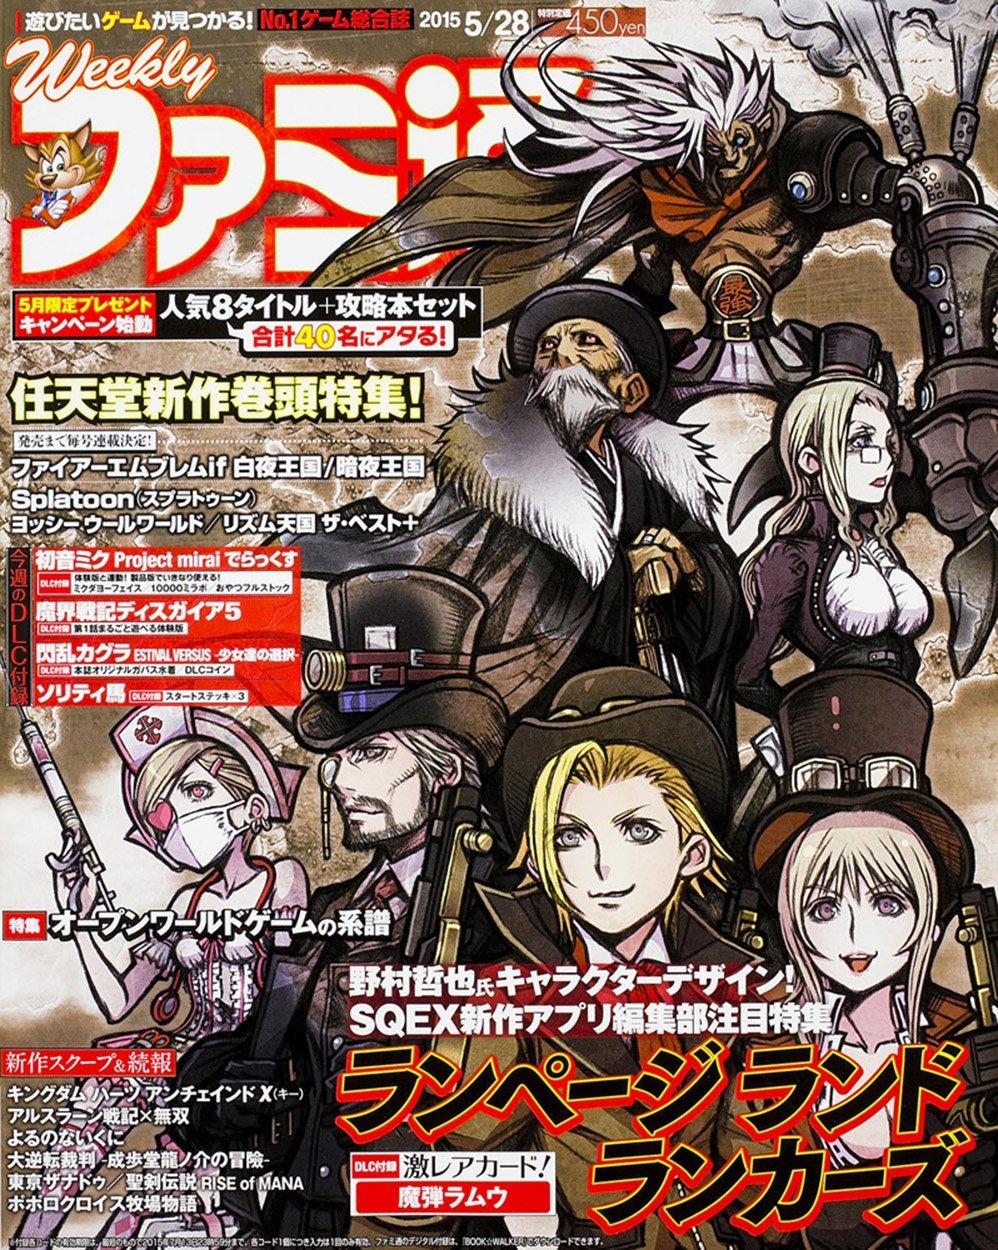 Famitsu 1380 May 28, 2015